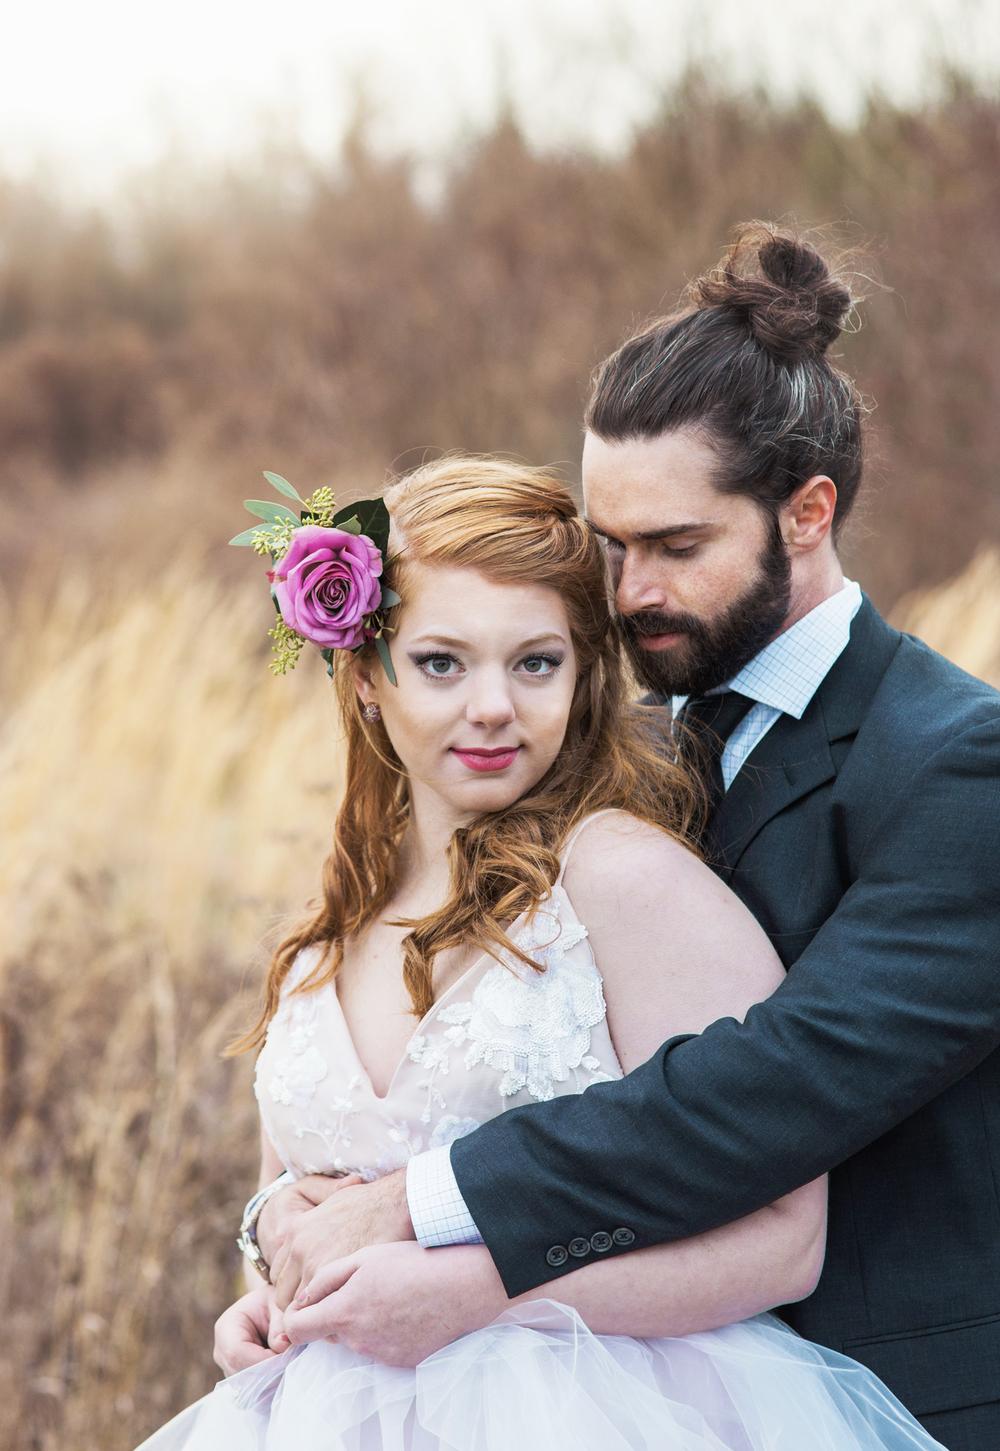 Sara + Matt + Ella _Give Back Bride_Styled Wedding Shoot _K. Stoddard Photography028.jpg